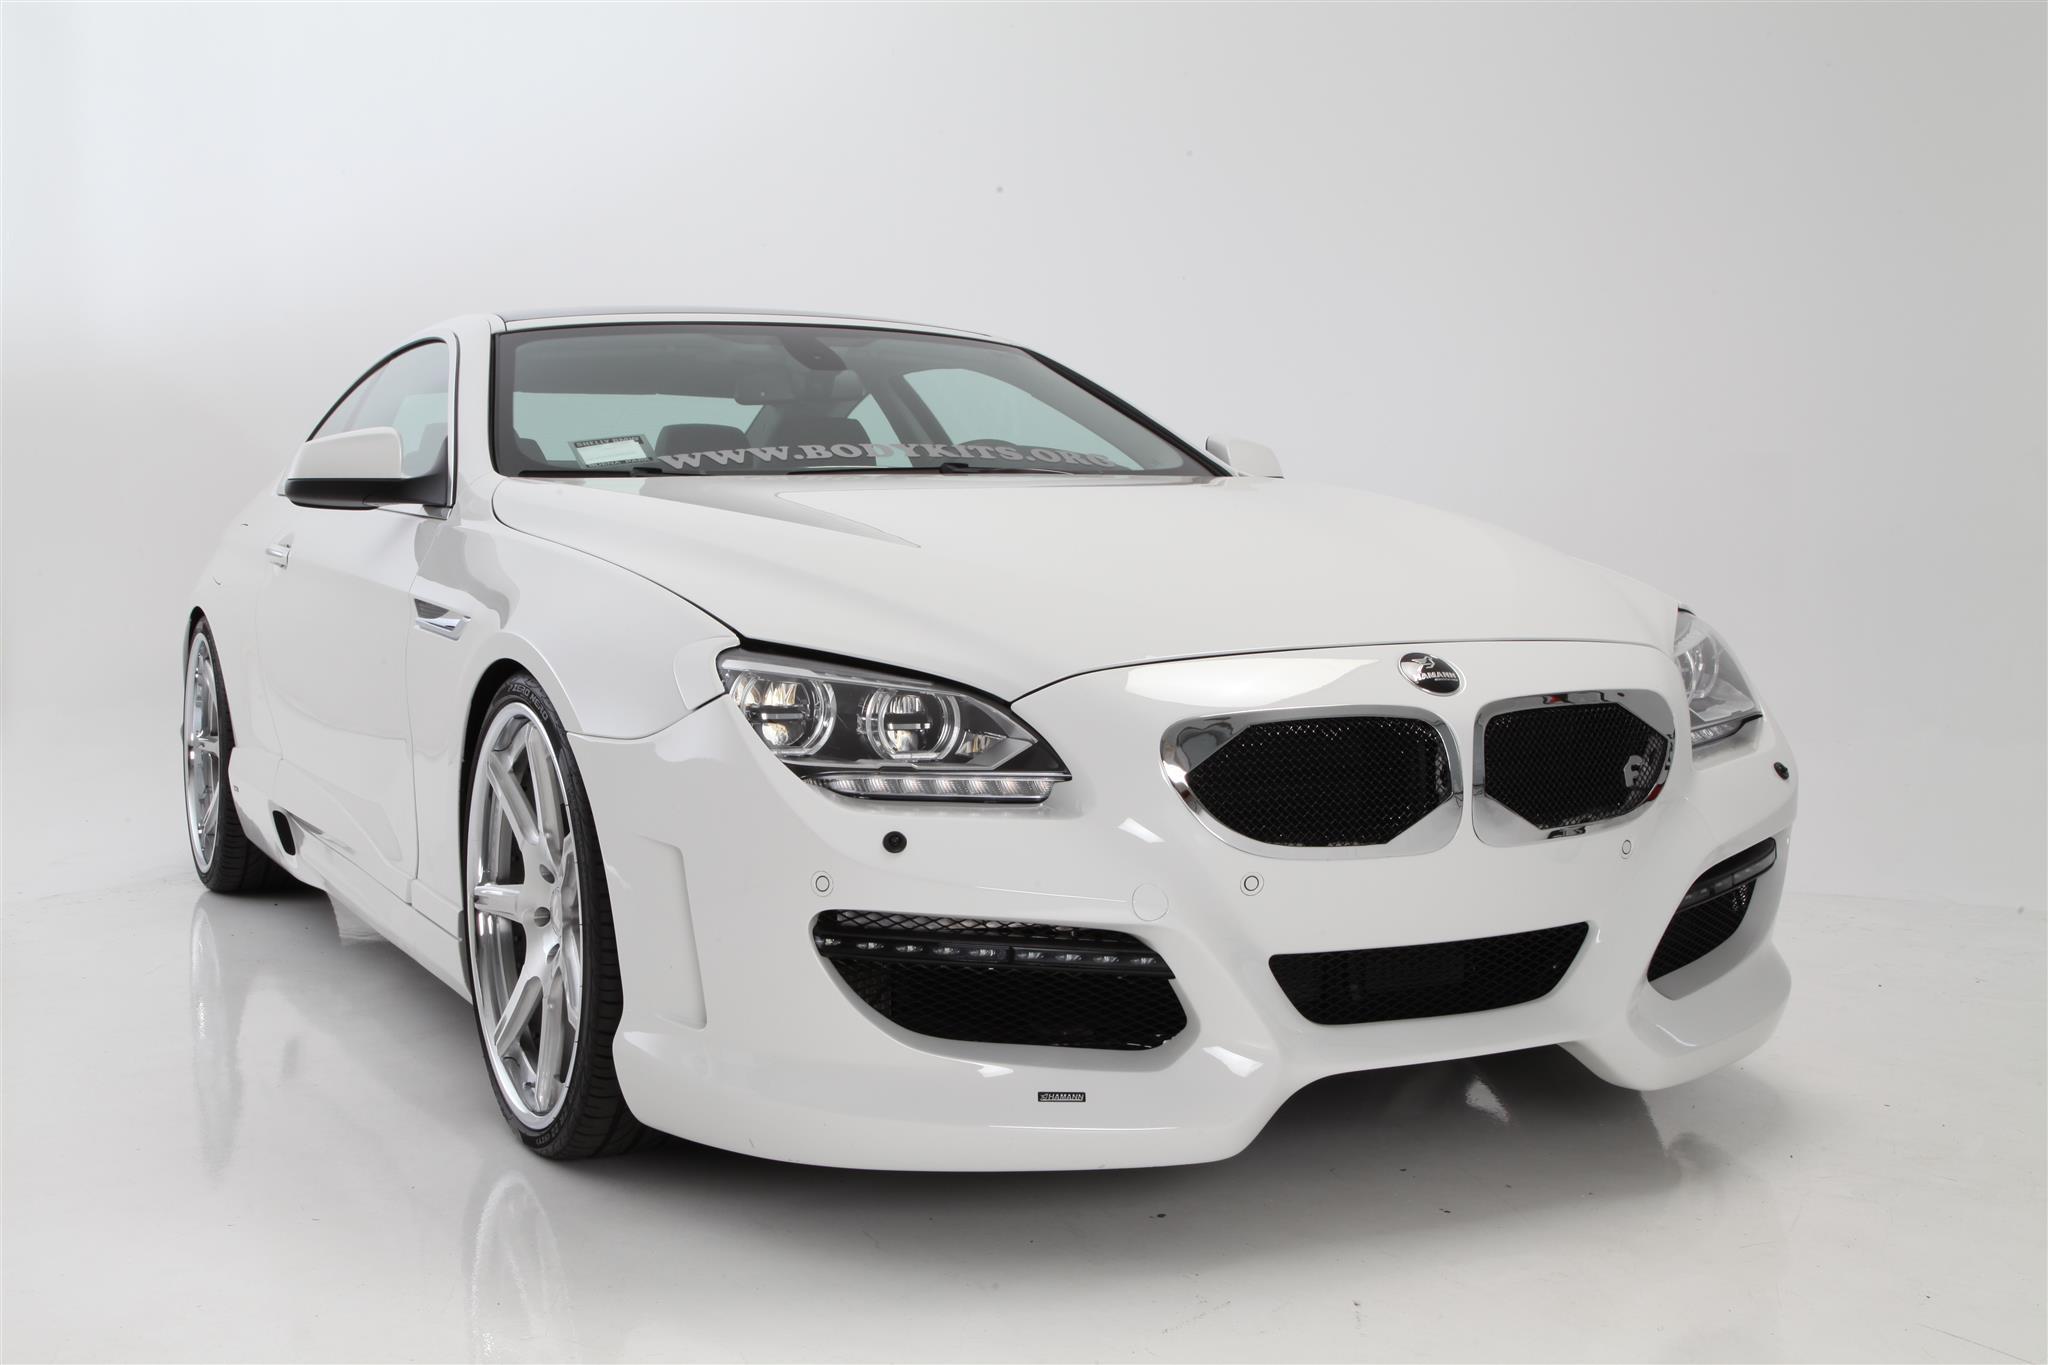 BMW - 6 Series - 2012 - Wheels & Tires